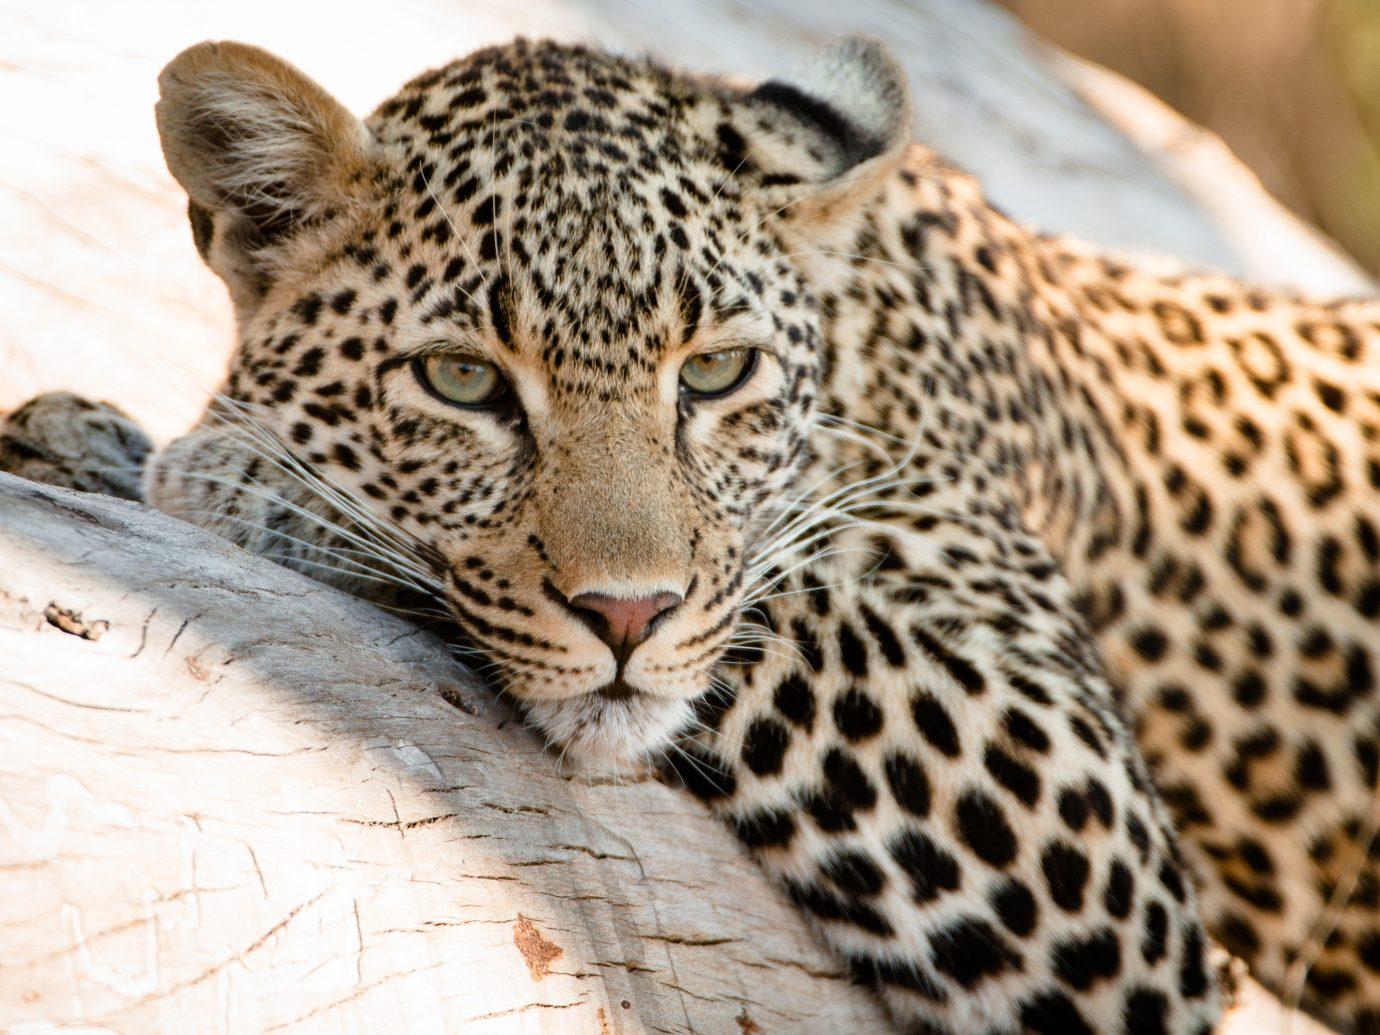 Offbeat Safaris animal mammal big cat outdoor leopard vertebrate fauna Wildlife cat like mammal close up whiskers big cats